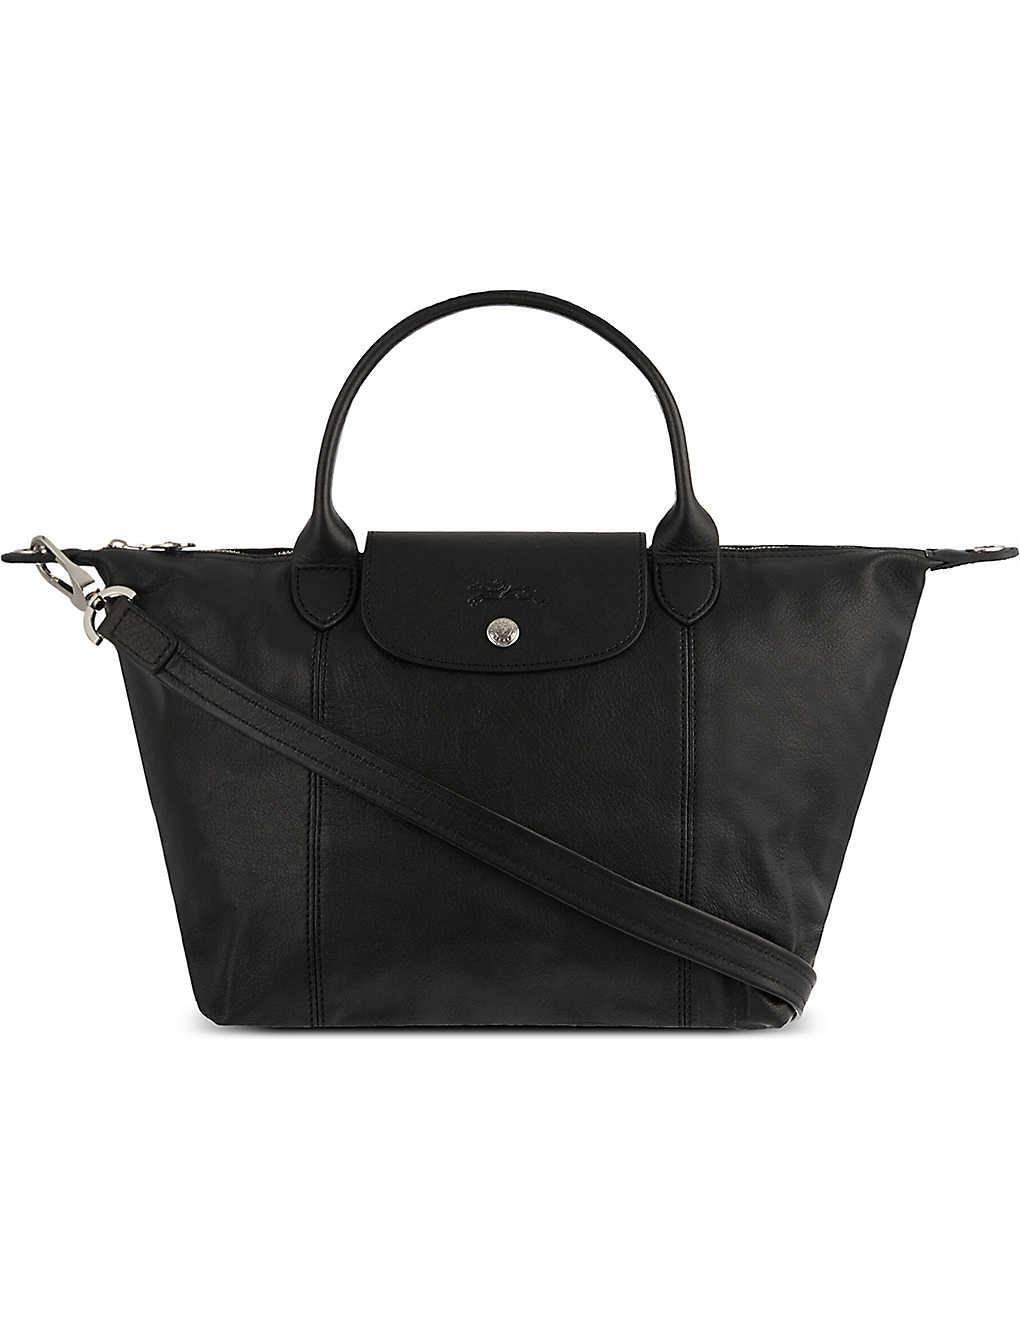 9f0679cb444 LONGCHAMP - Le Pliage Cuir small handbag | Selfridges.com